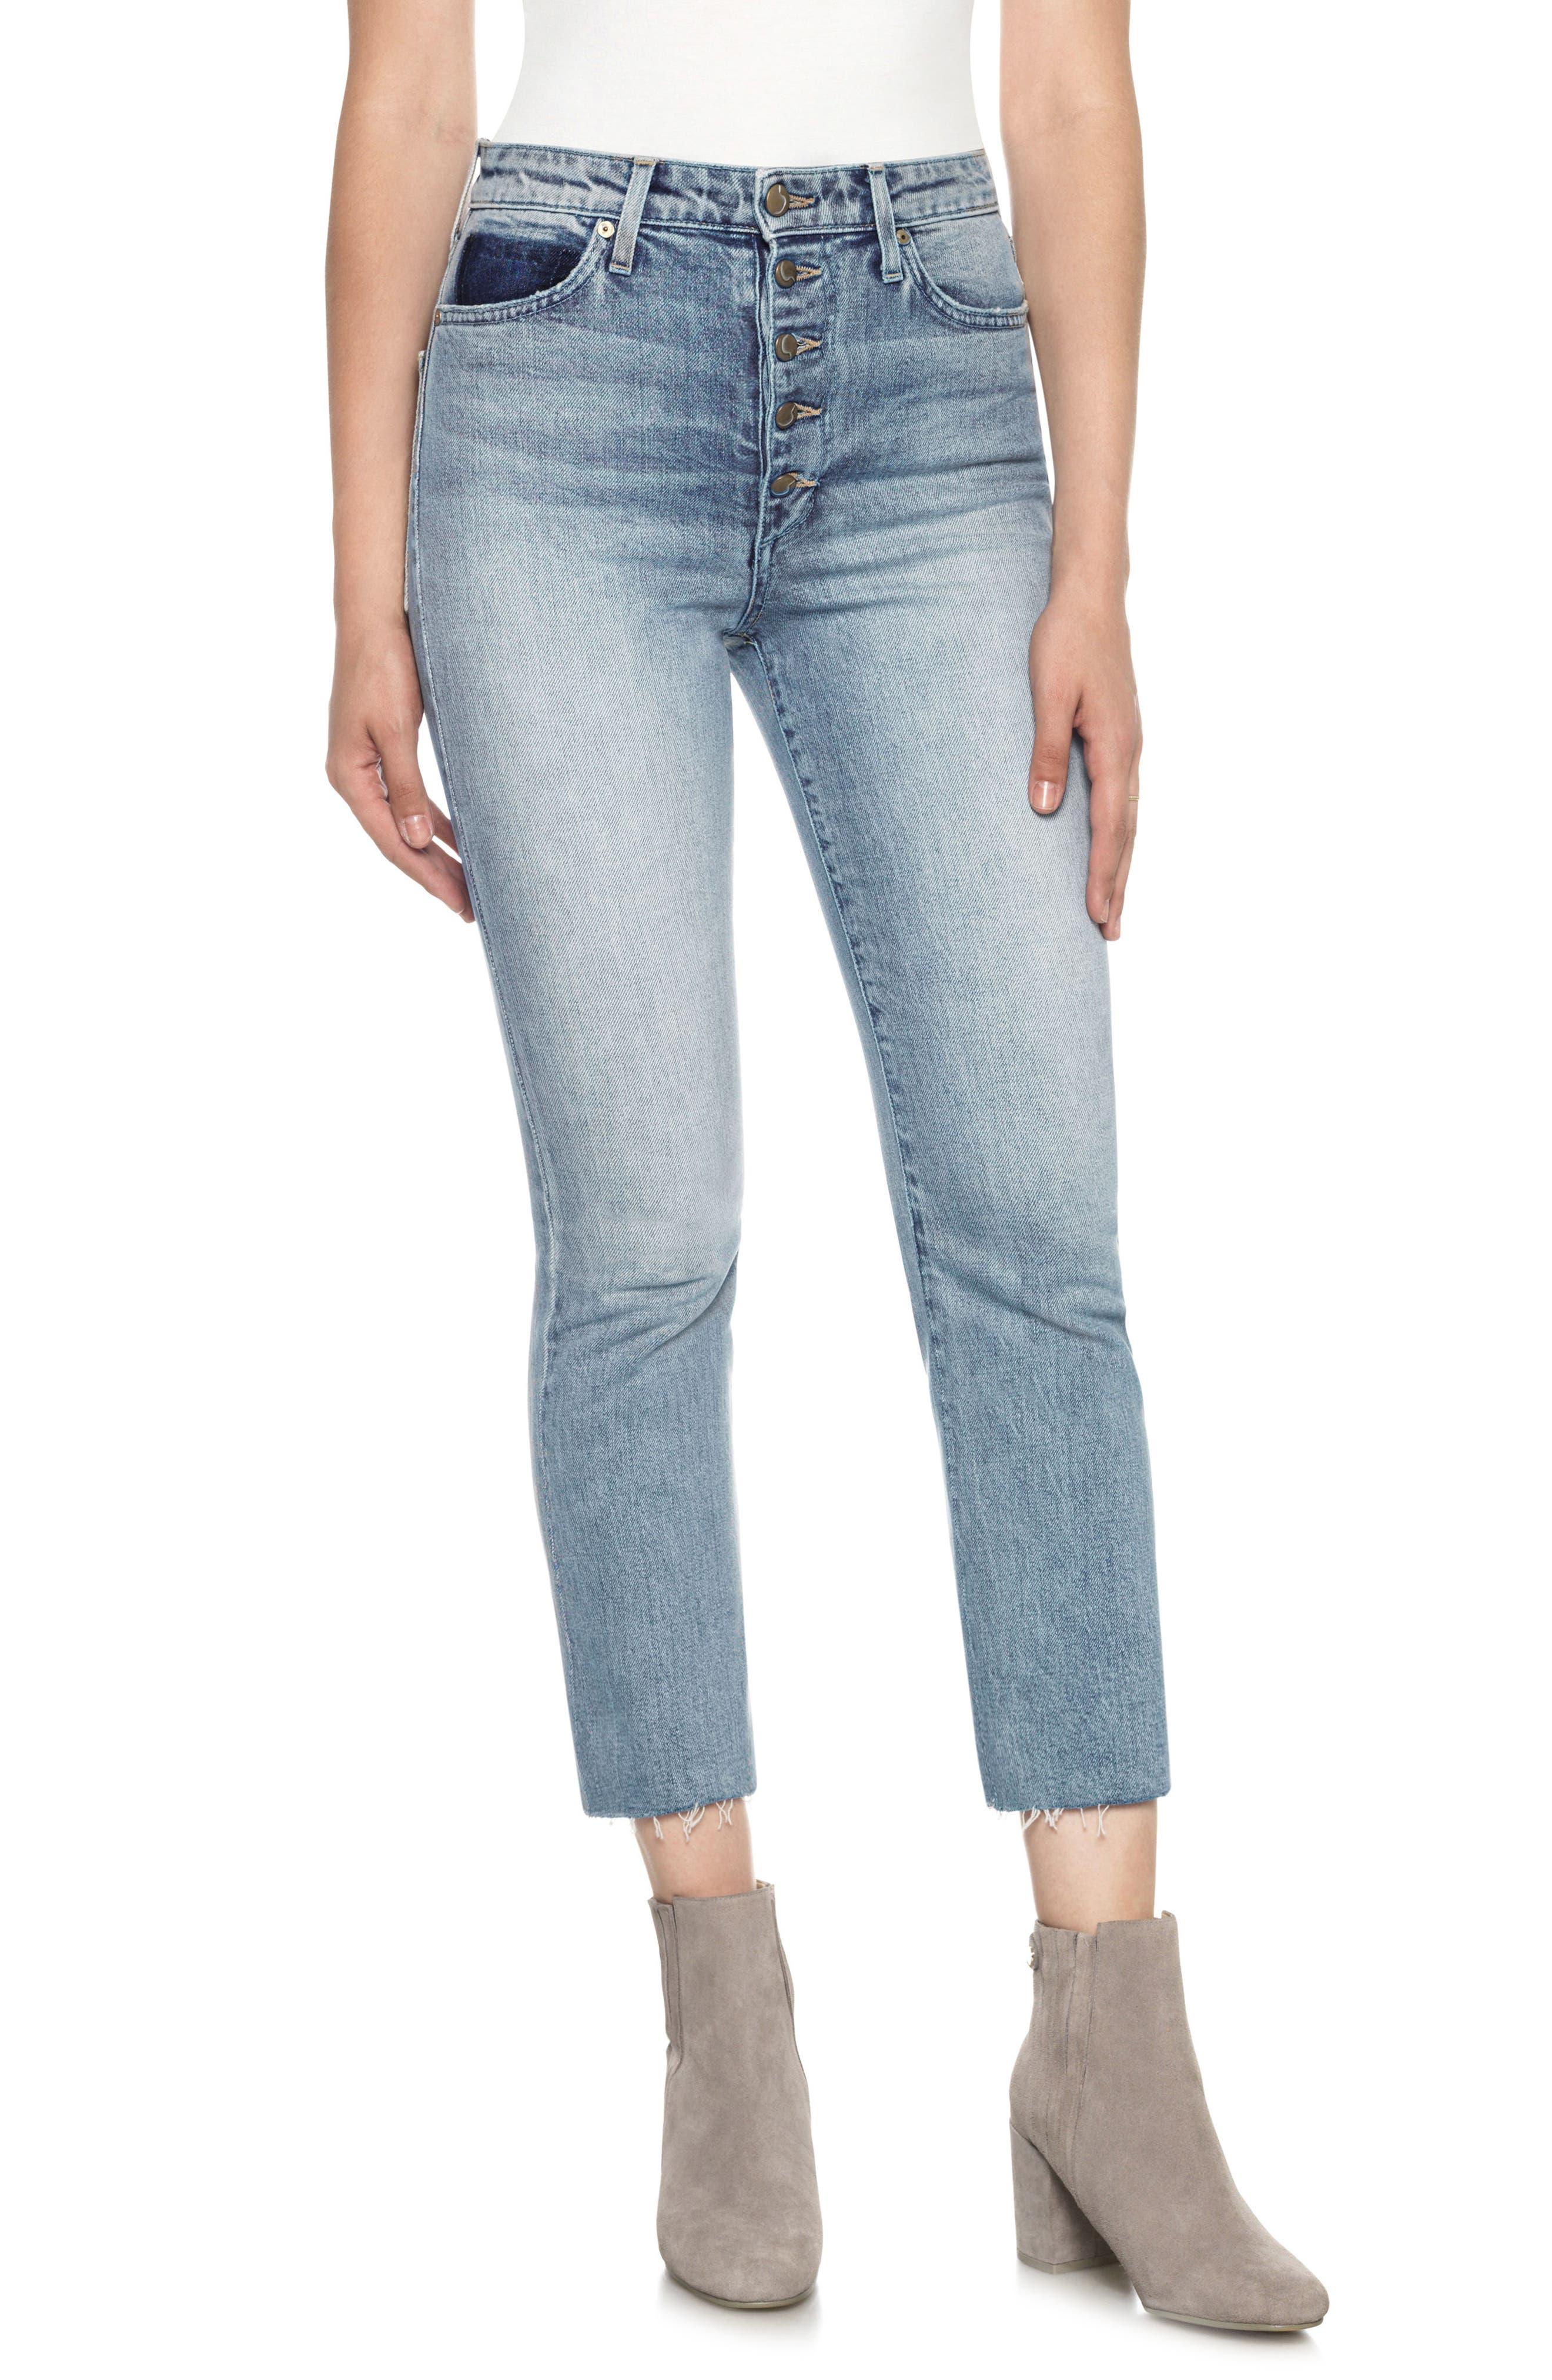 Alternate Image 1 Selected - Joe's Debbie High Waist Crop Boyfriend Jeans (Kamryn)